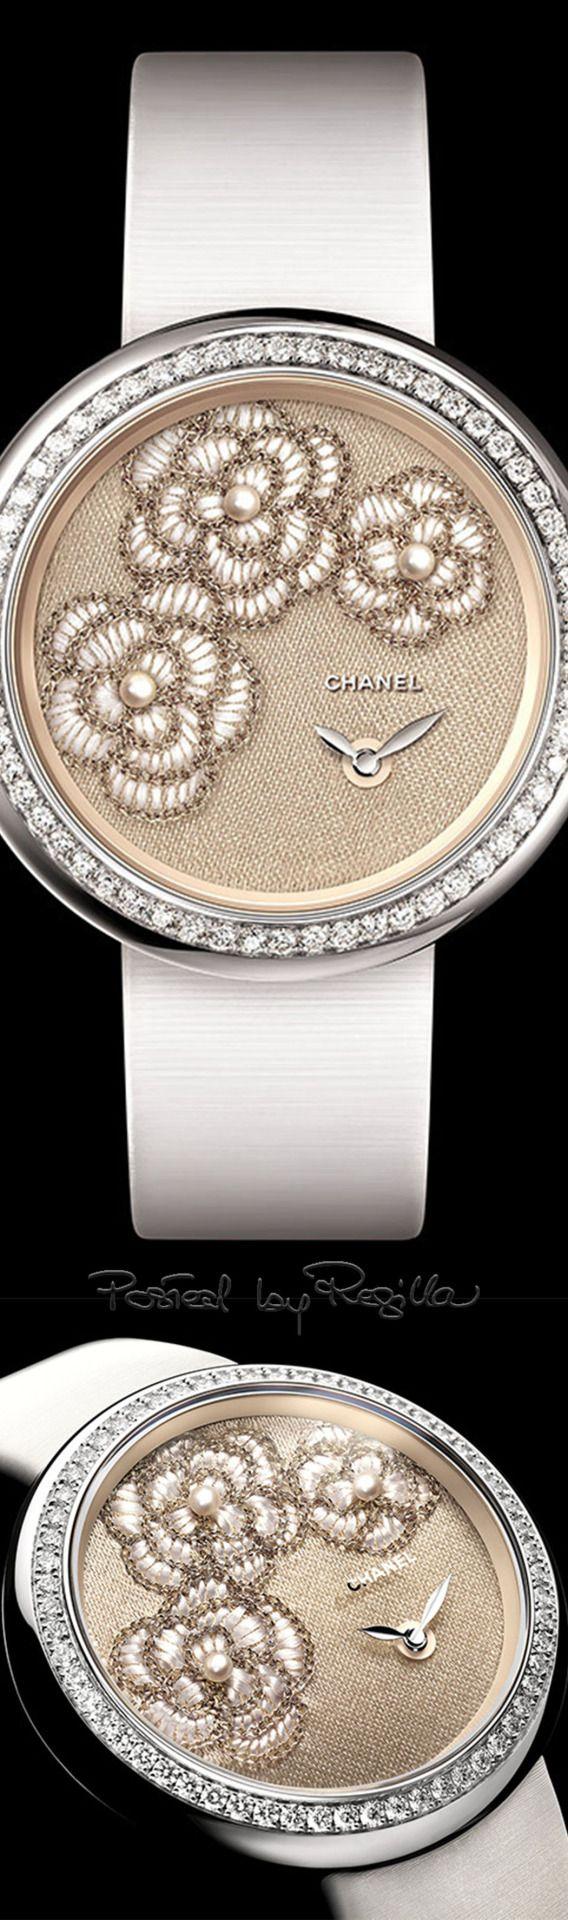 Fashion*Jewellery*Watches | RosamariaGFrangini || Regilla ⚜ Chanel